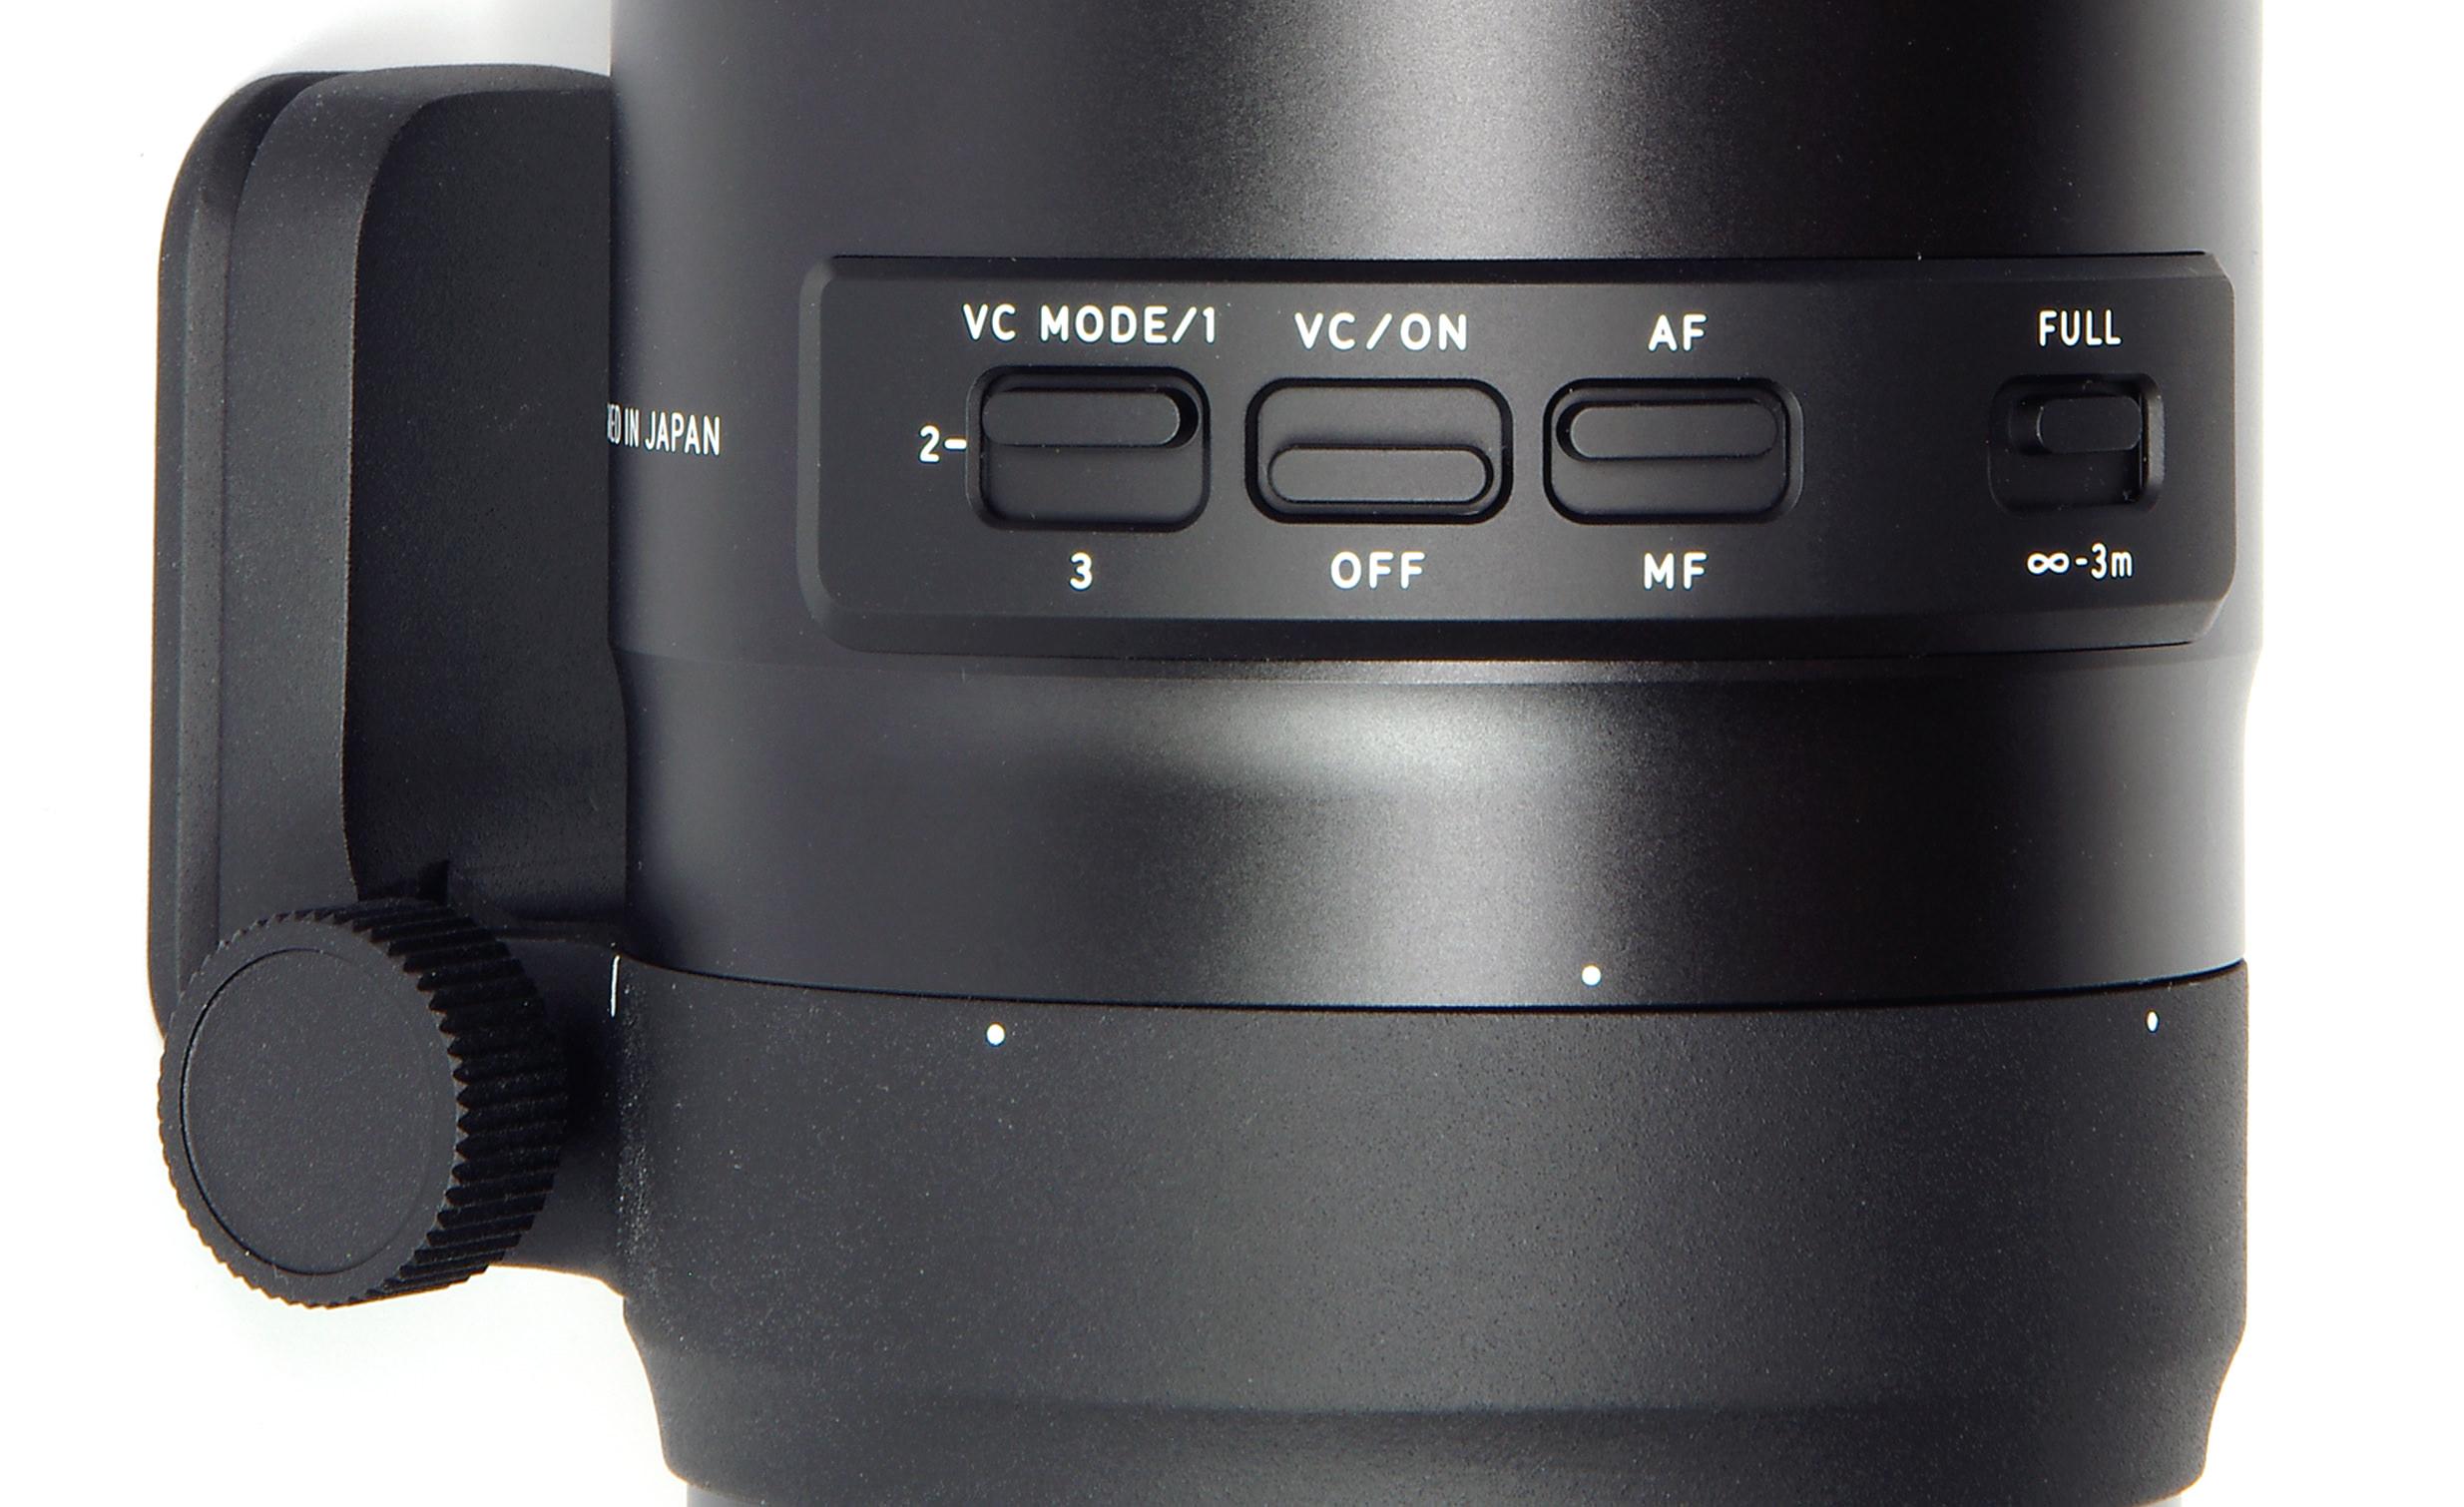 Tamron SP 70-200mm f/2.8 Di VC USD G2 (A025) Review ...